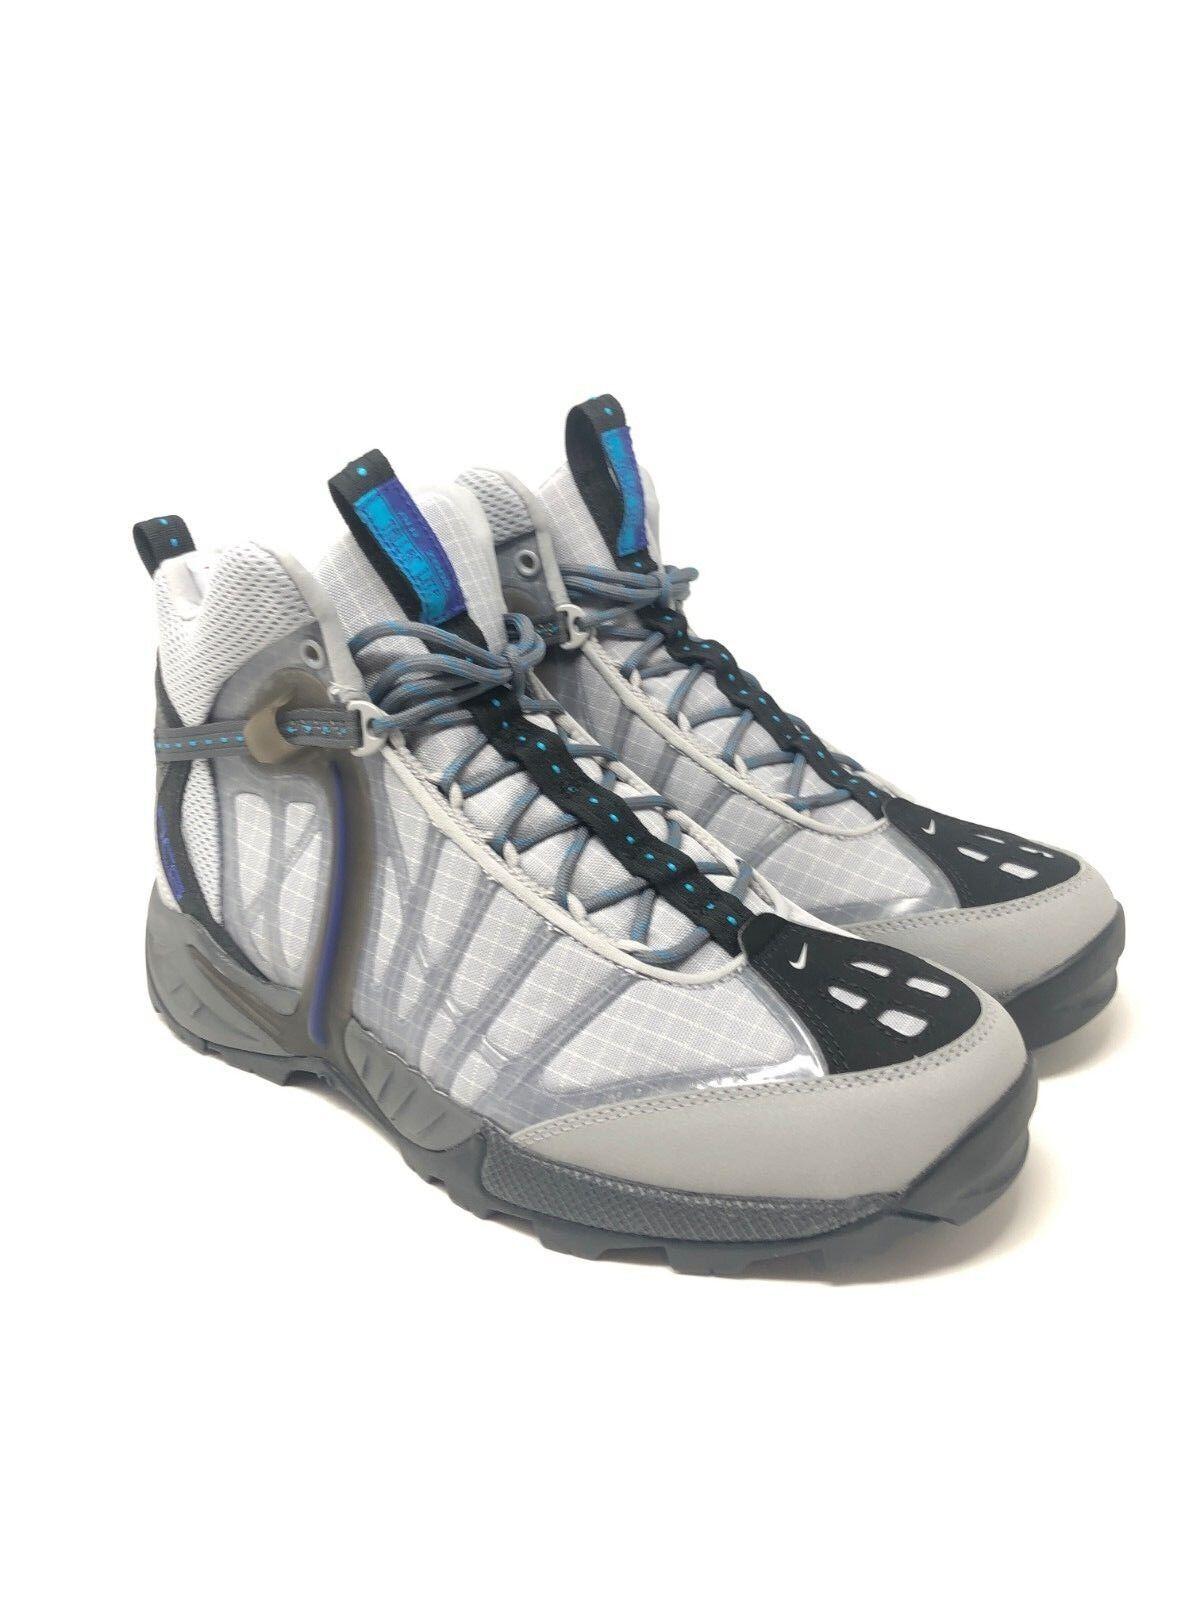 Nike Zoom sizec Lite OG 844018-002 Pure Platinum Hiking shoes [ Multi Size ]